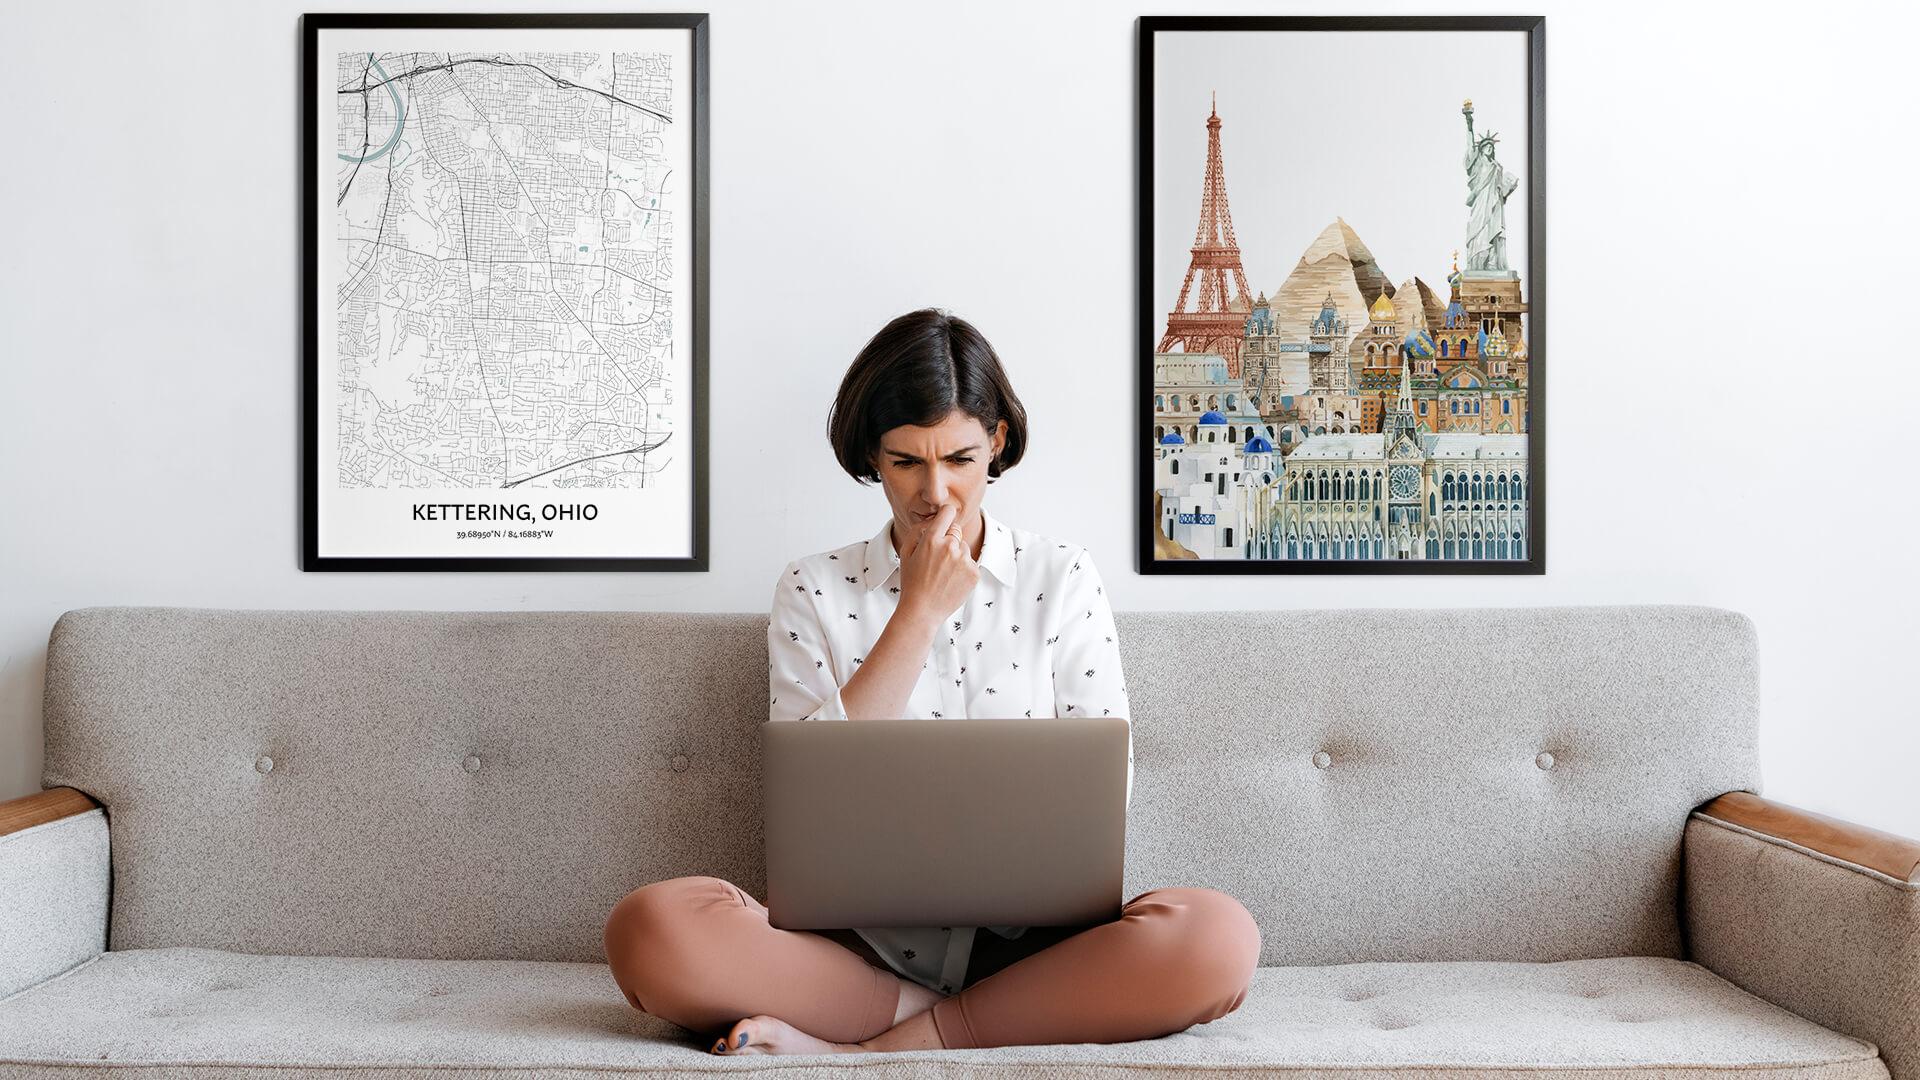 Kettering city map art